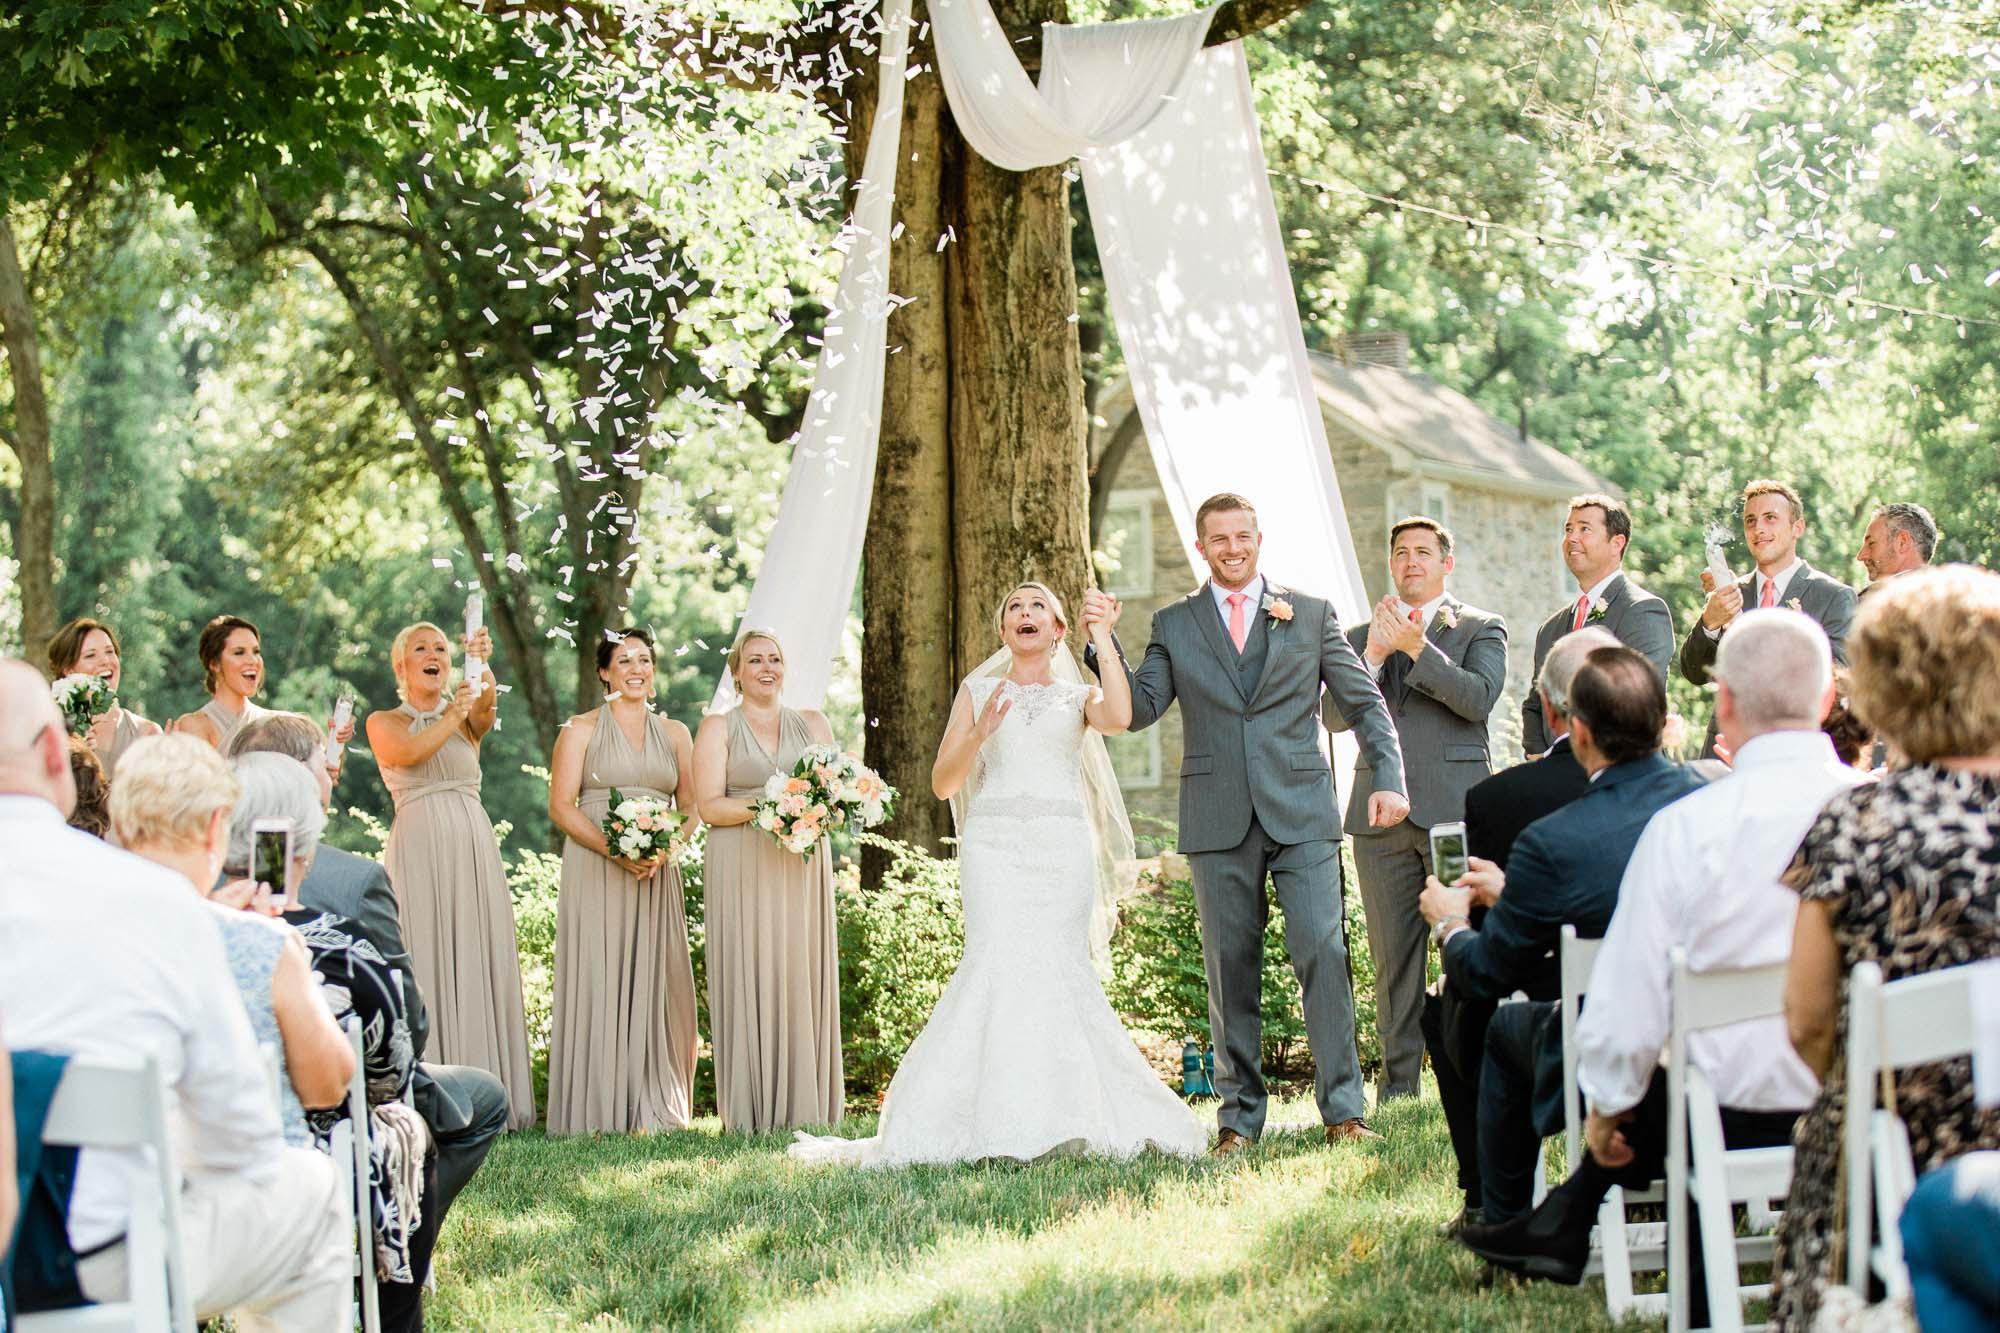 Allenberry-resort-historic-pennsylvania-wedding-22136.jpg